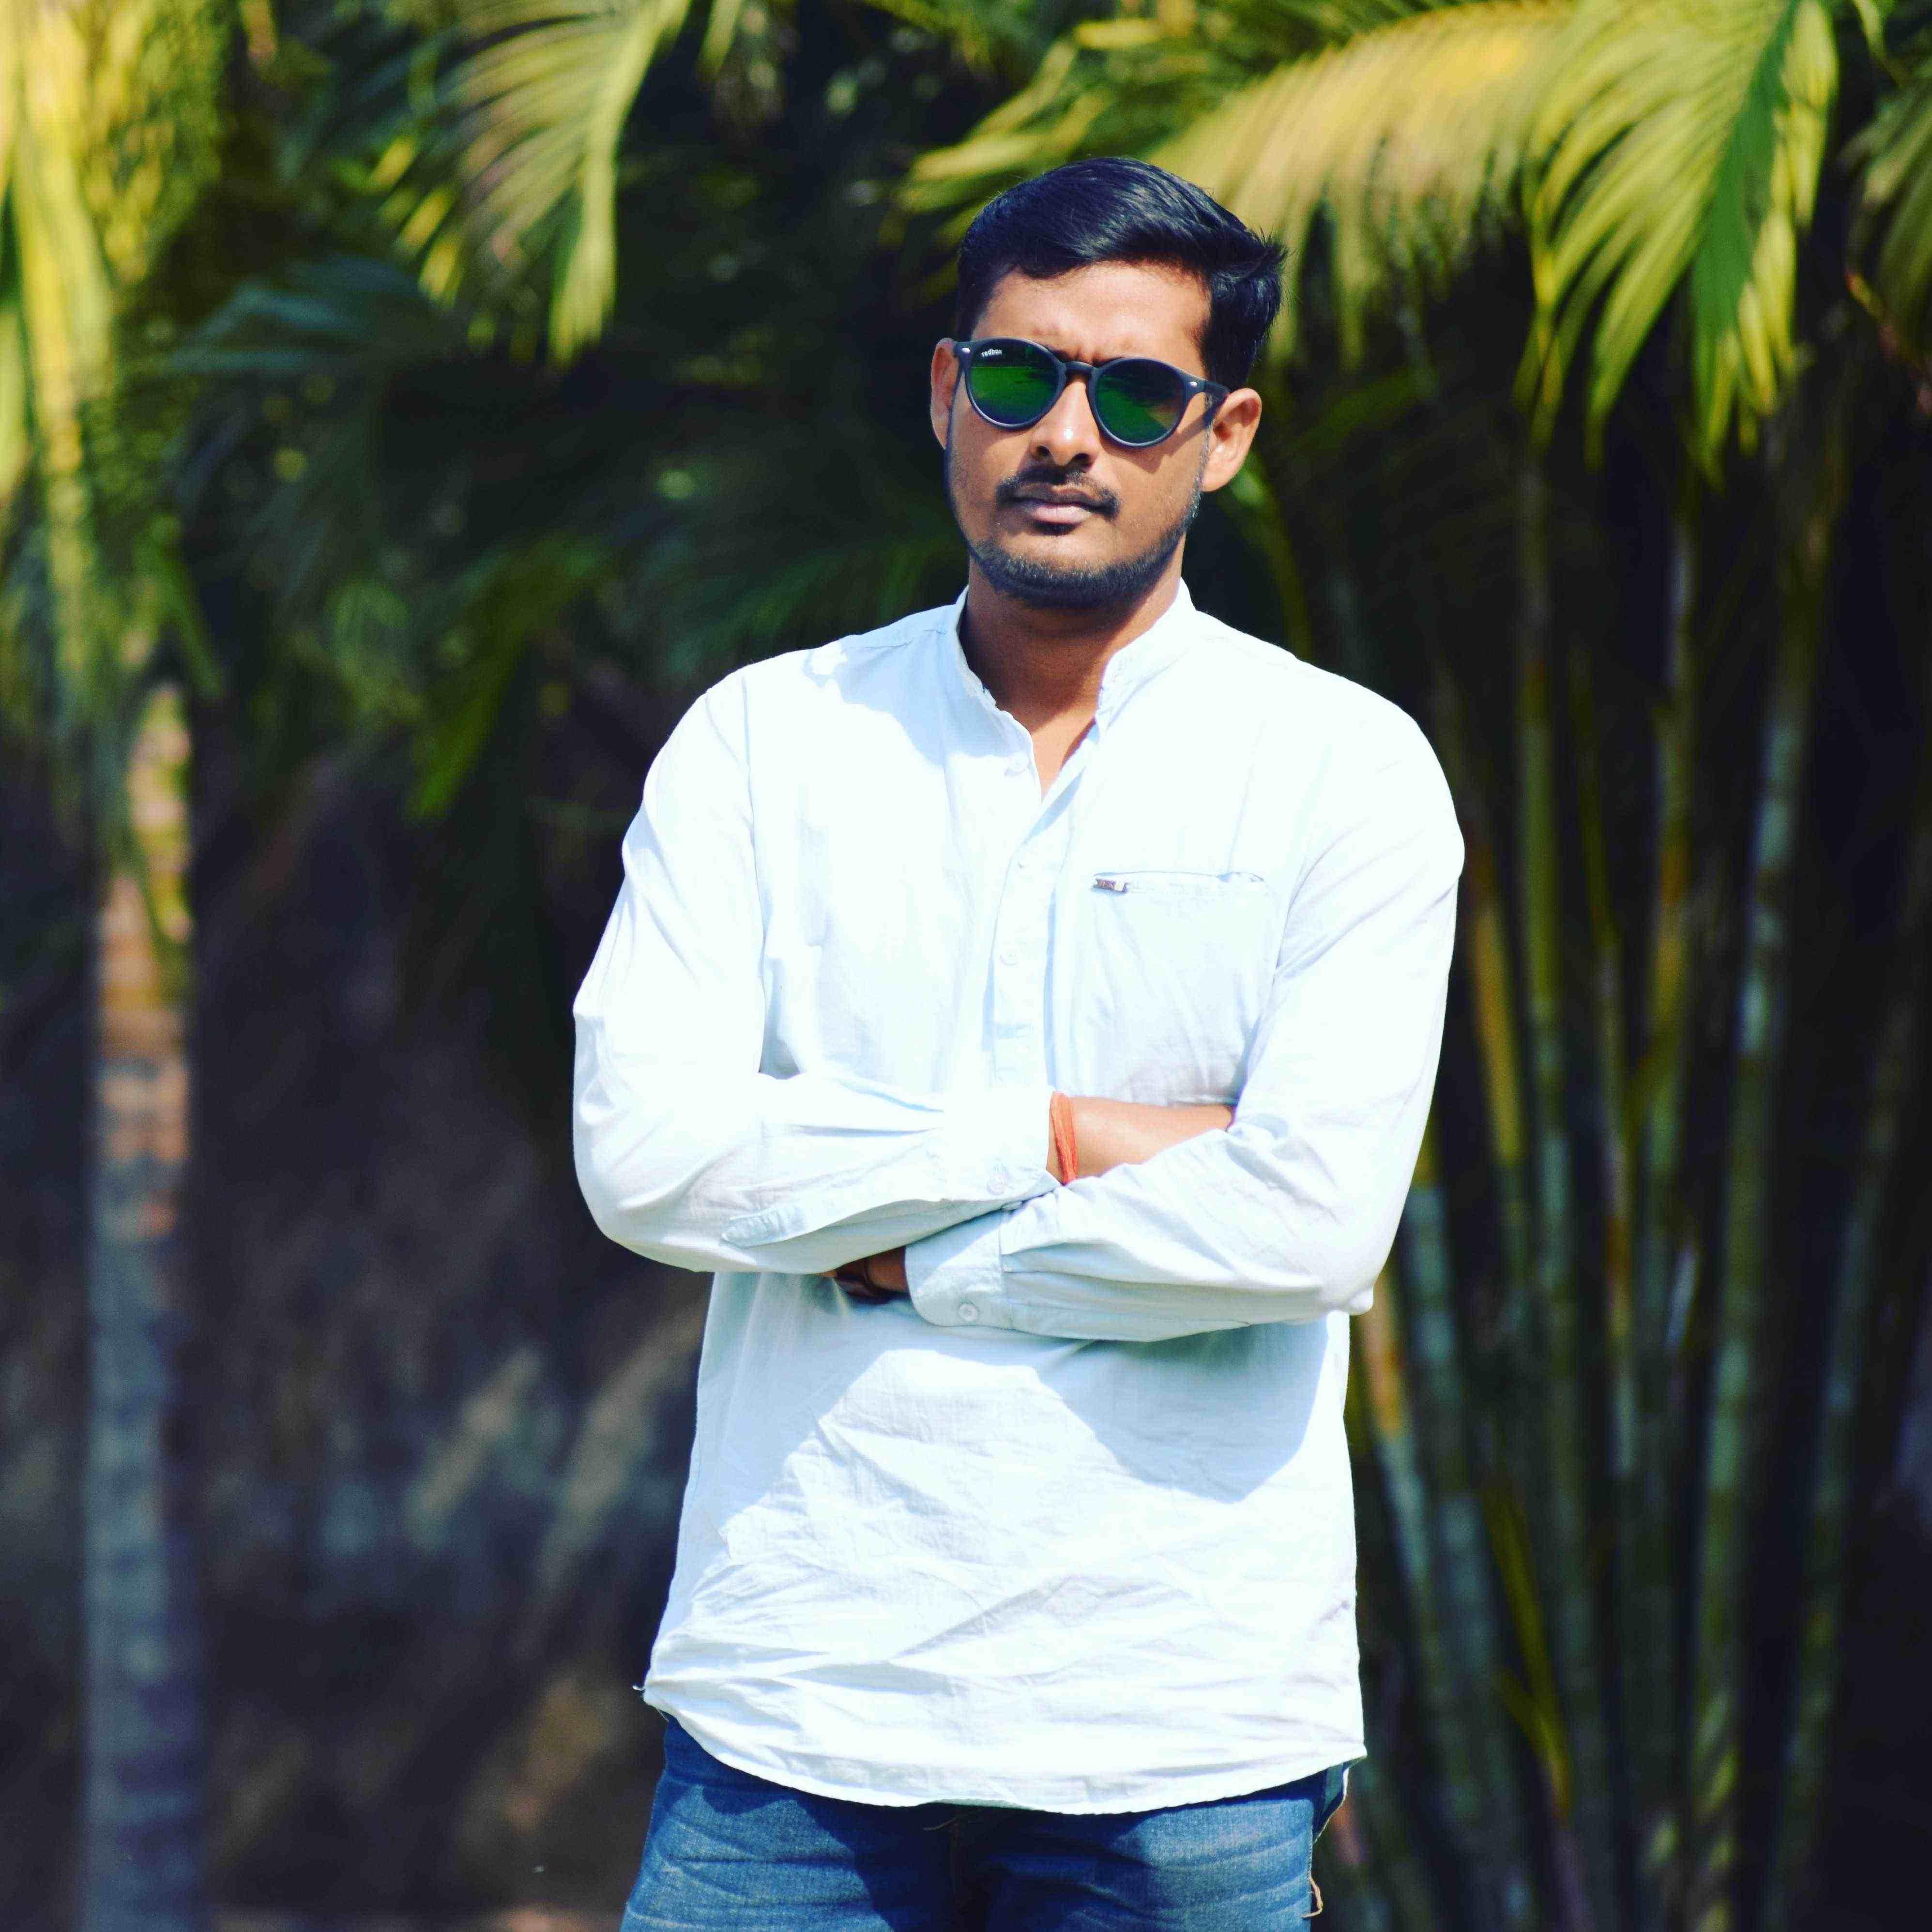 Larence Pradhan Unemployed Engineer cum poet  कलम का प्रेमी हूँ... कलम से प्रेमी हूँ